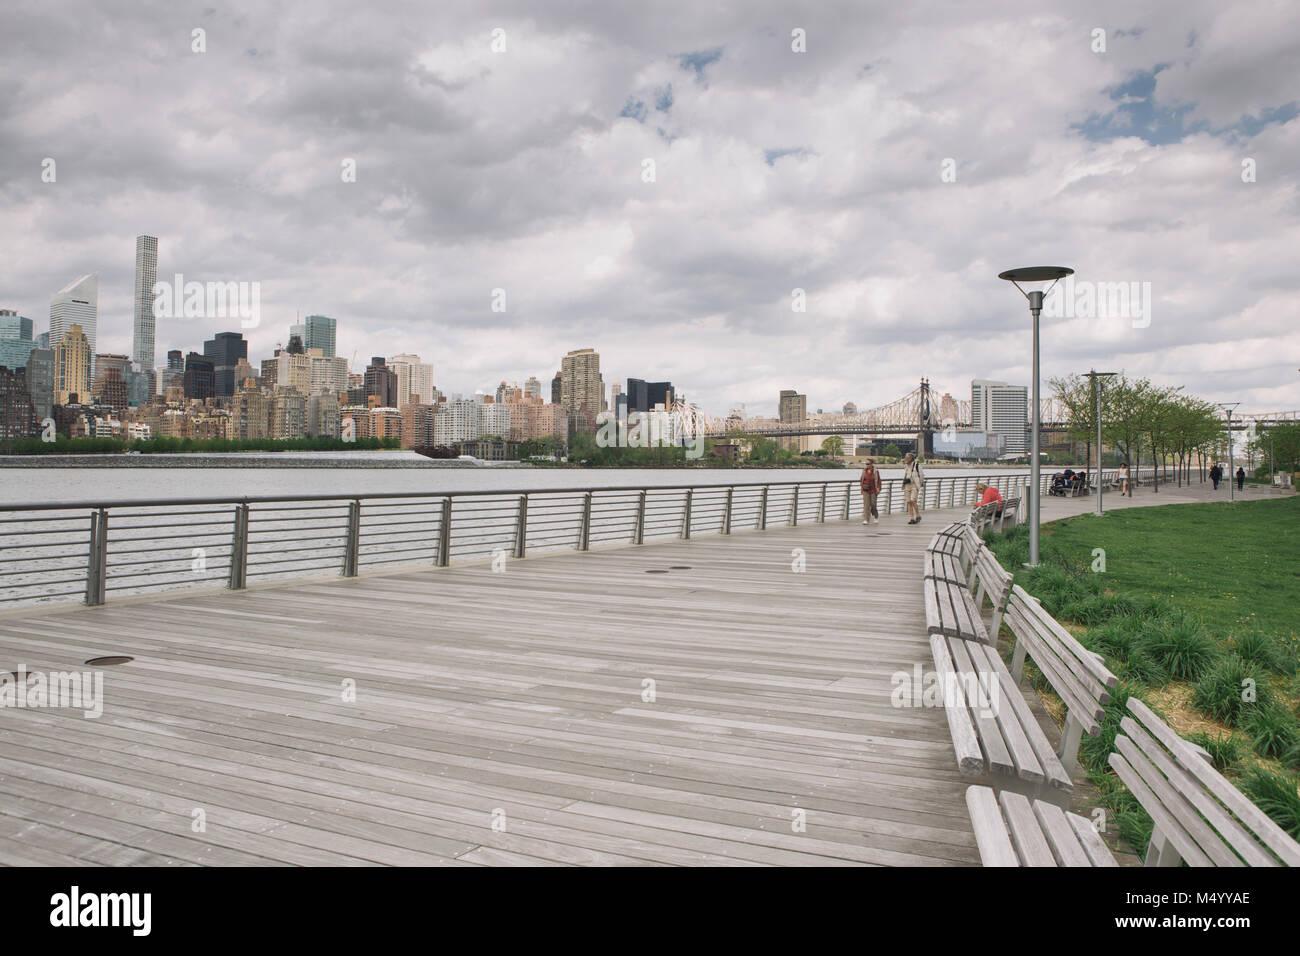 Boardwalk promenade with view of New York City skyline, Gantry Plaza State Park, Long Island City, New York City, USA Stock Photo